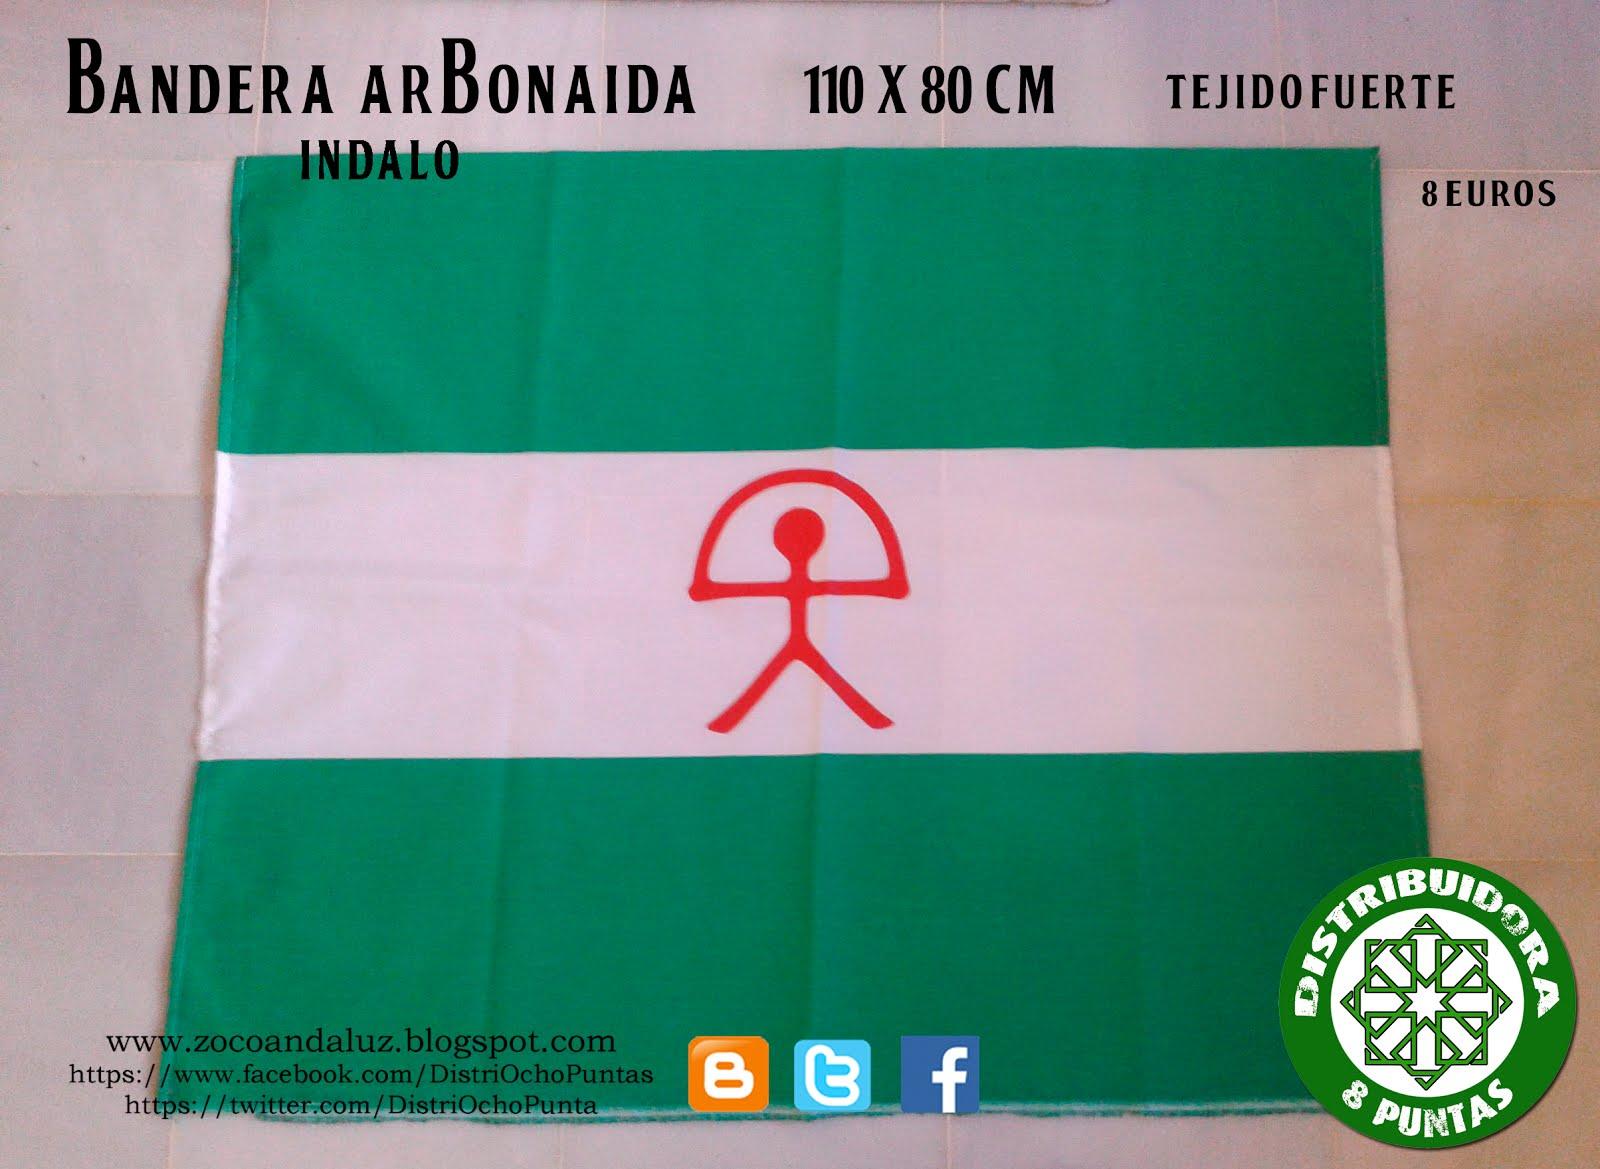 Bandera Arbonaida Indalo